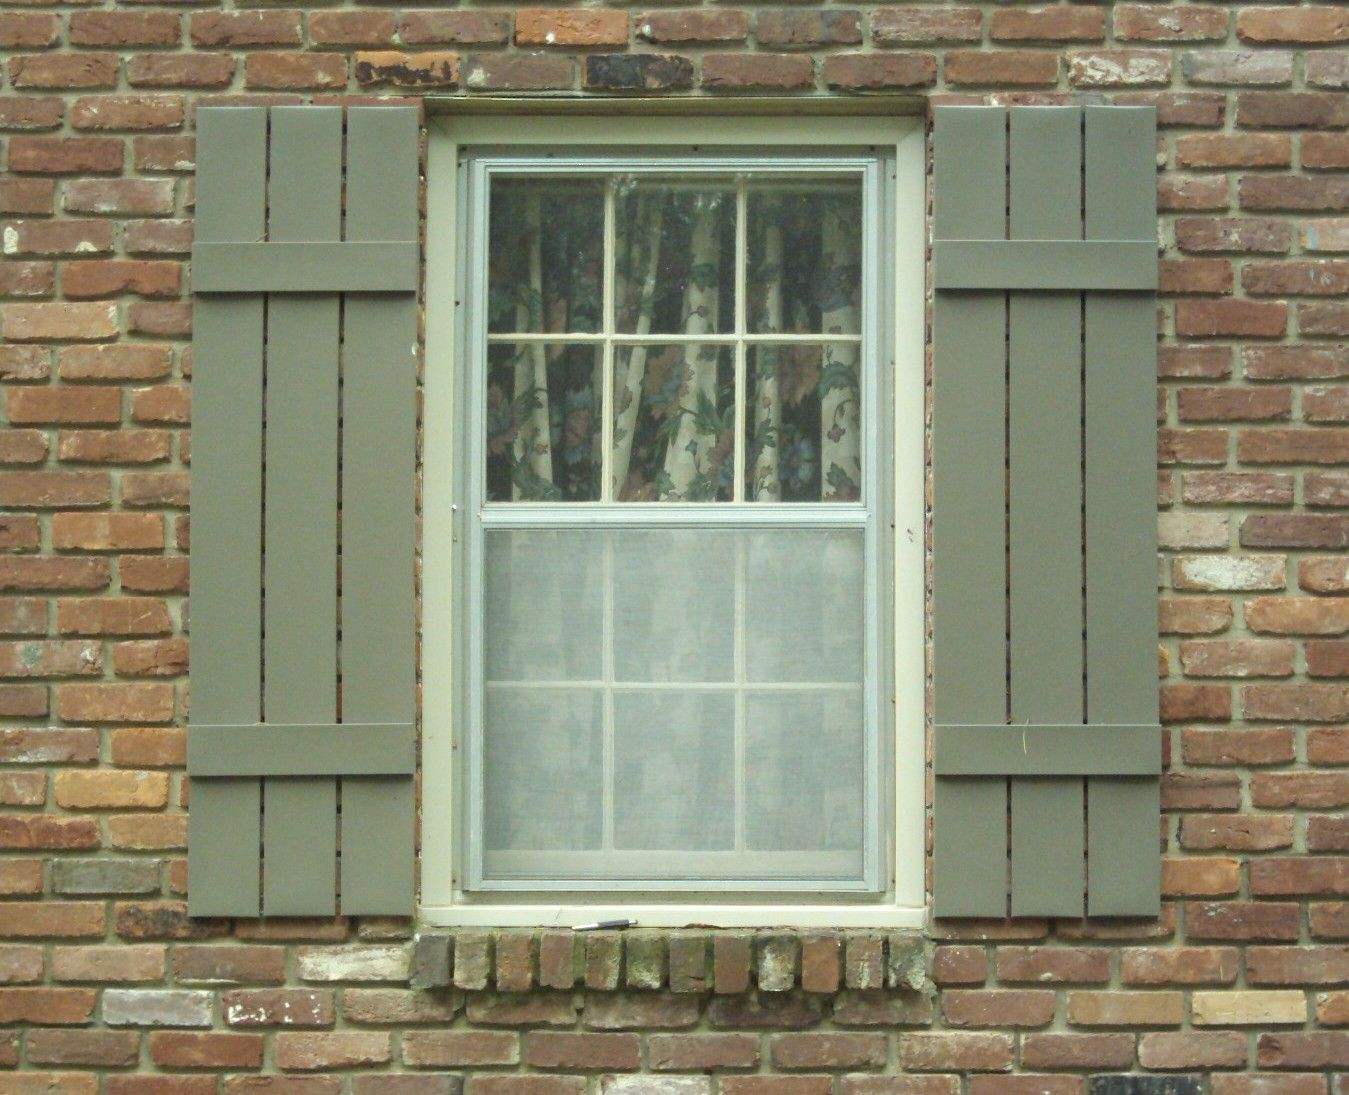 Exterior Shutters Custom Aluminum Exterior Window Shutters Window Shutters Exterior Shutters Exterior House Shutters